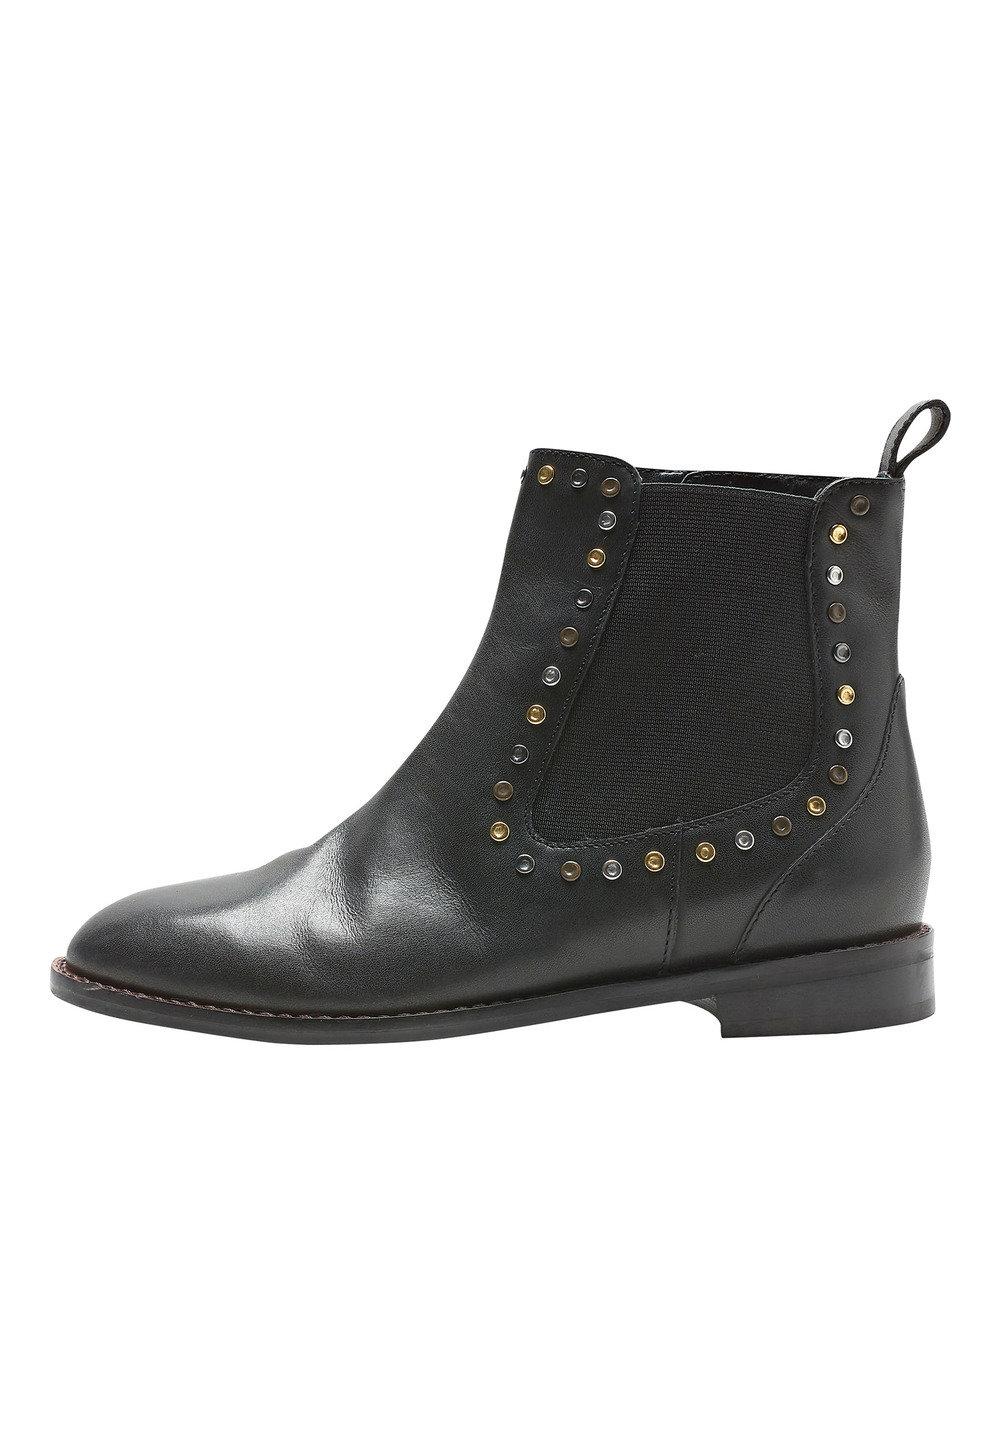 7237ec9c0251 Next Studded Chelsea Boots (Older Girls) Online